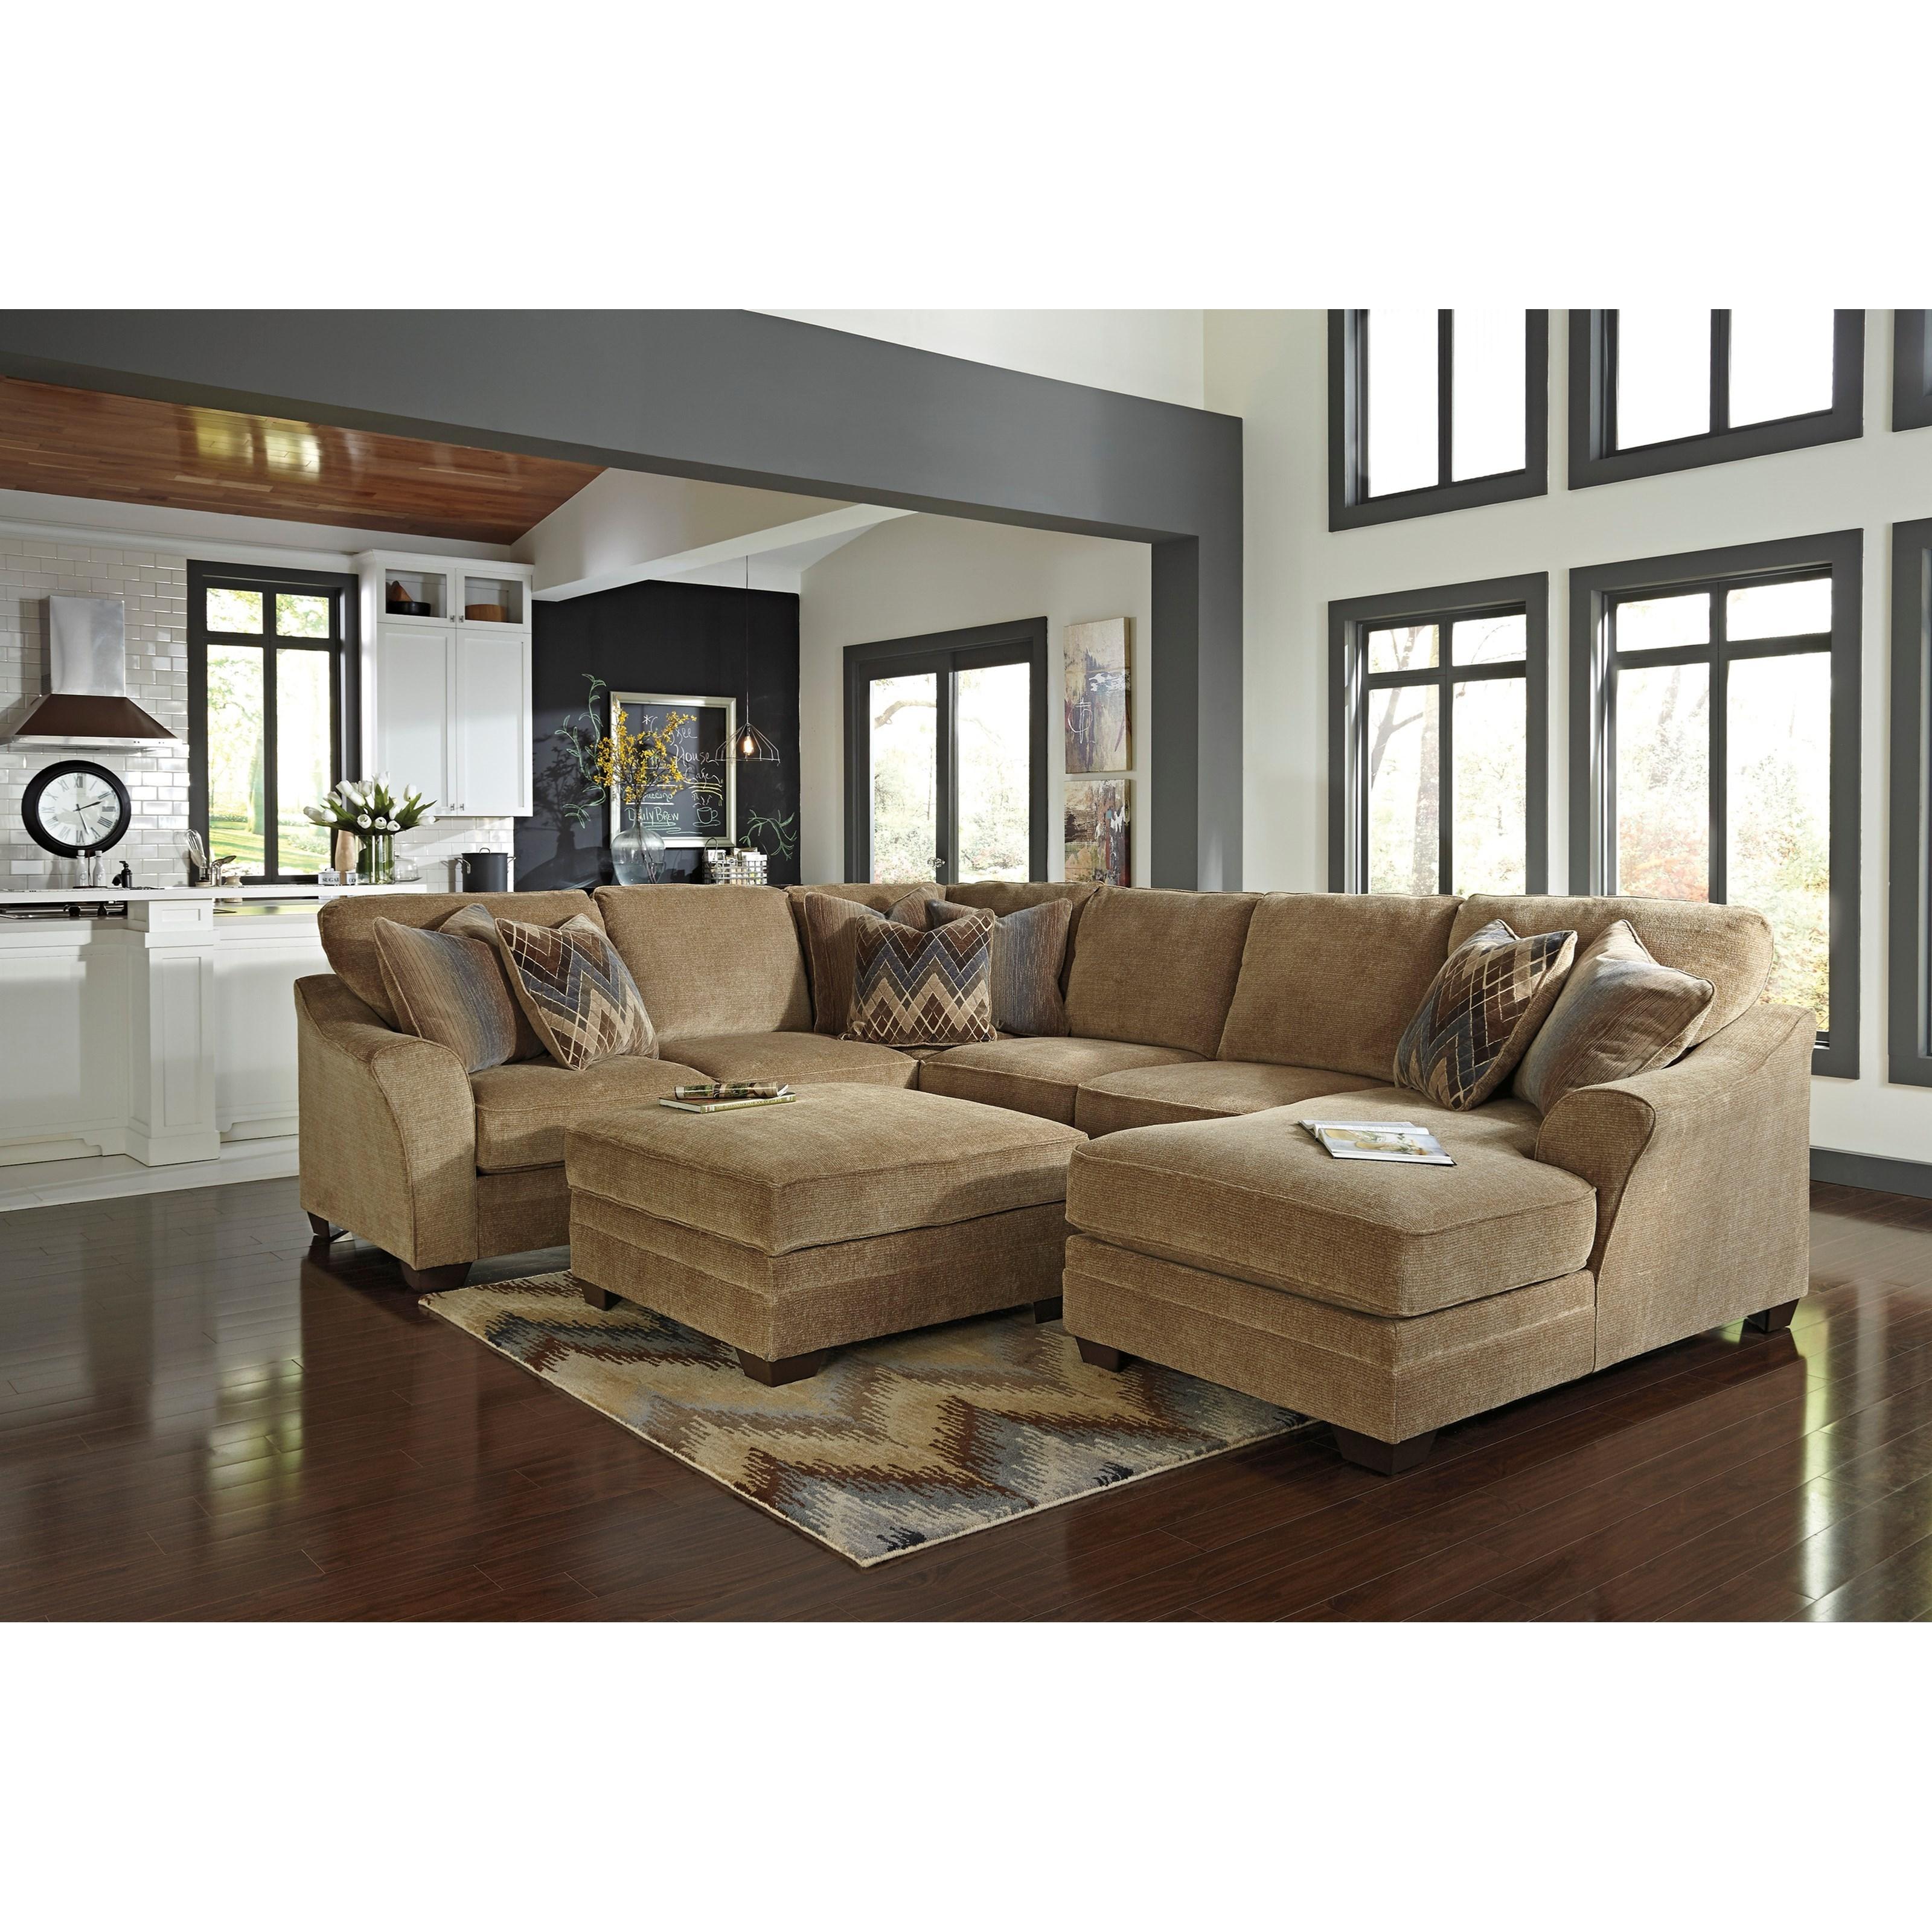 Ashley/Benchcraft Lonsdale Stationary Living Room Group - Item Number: 92111 Living Room Group 2